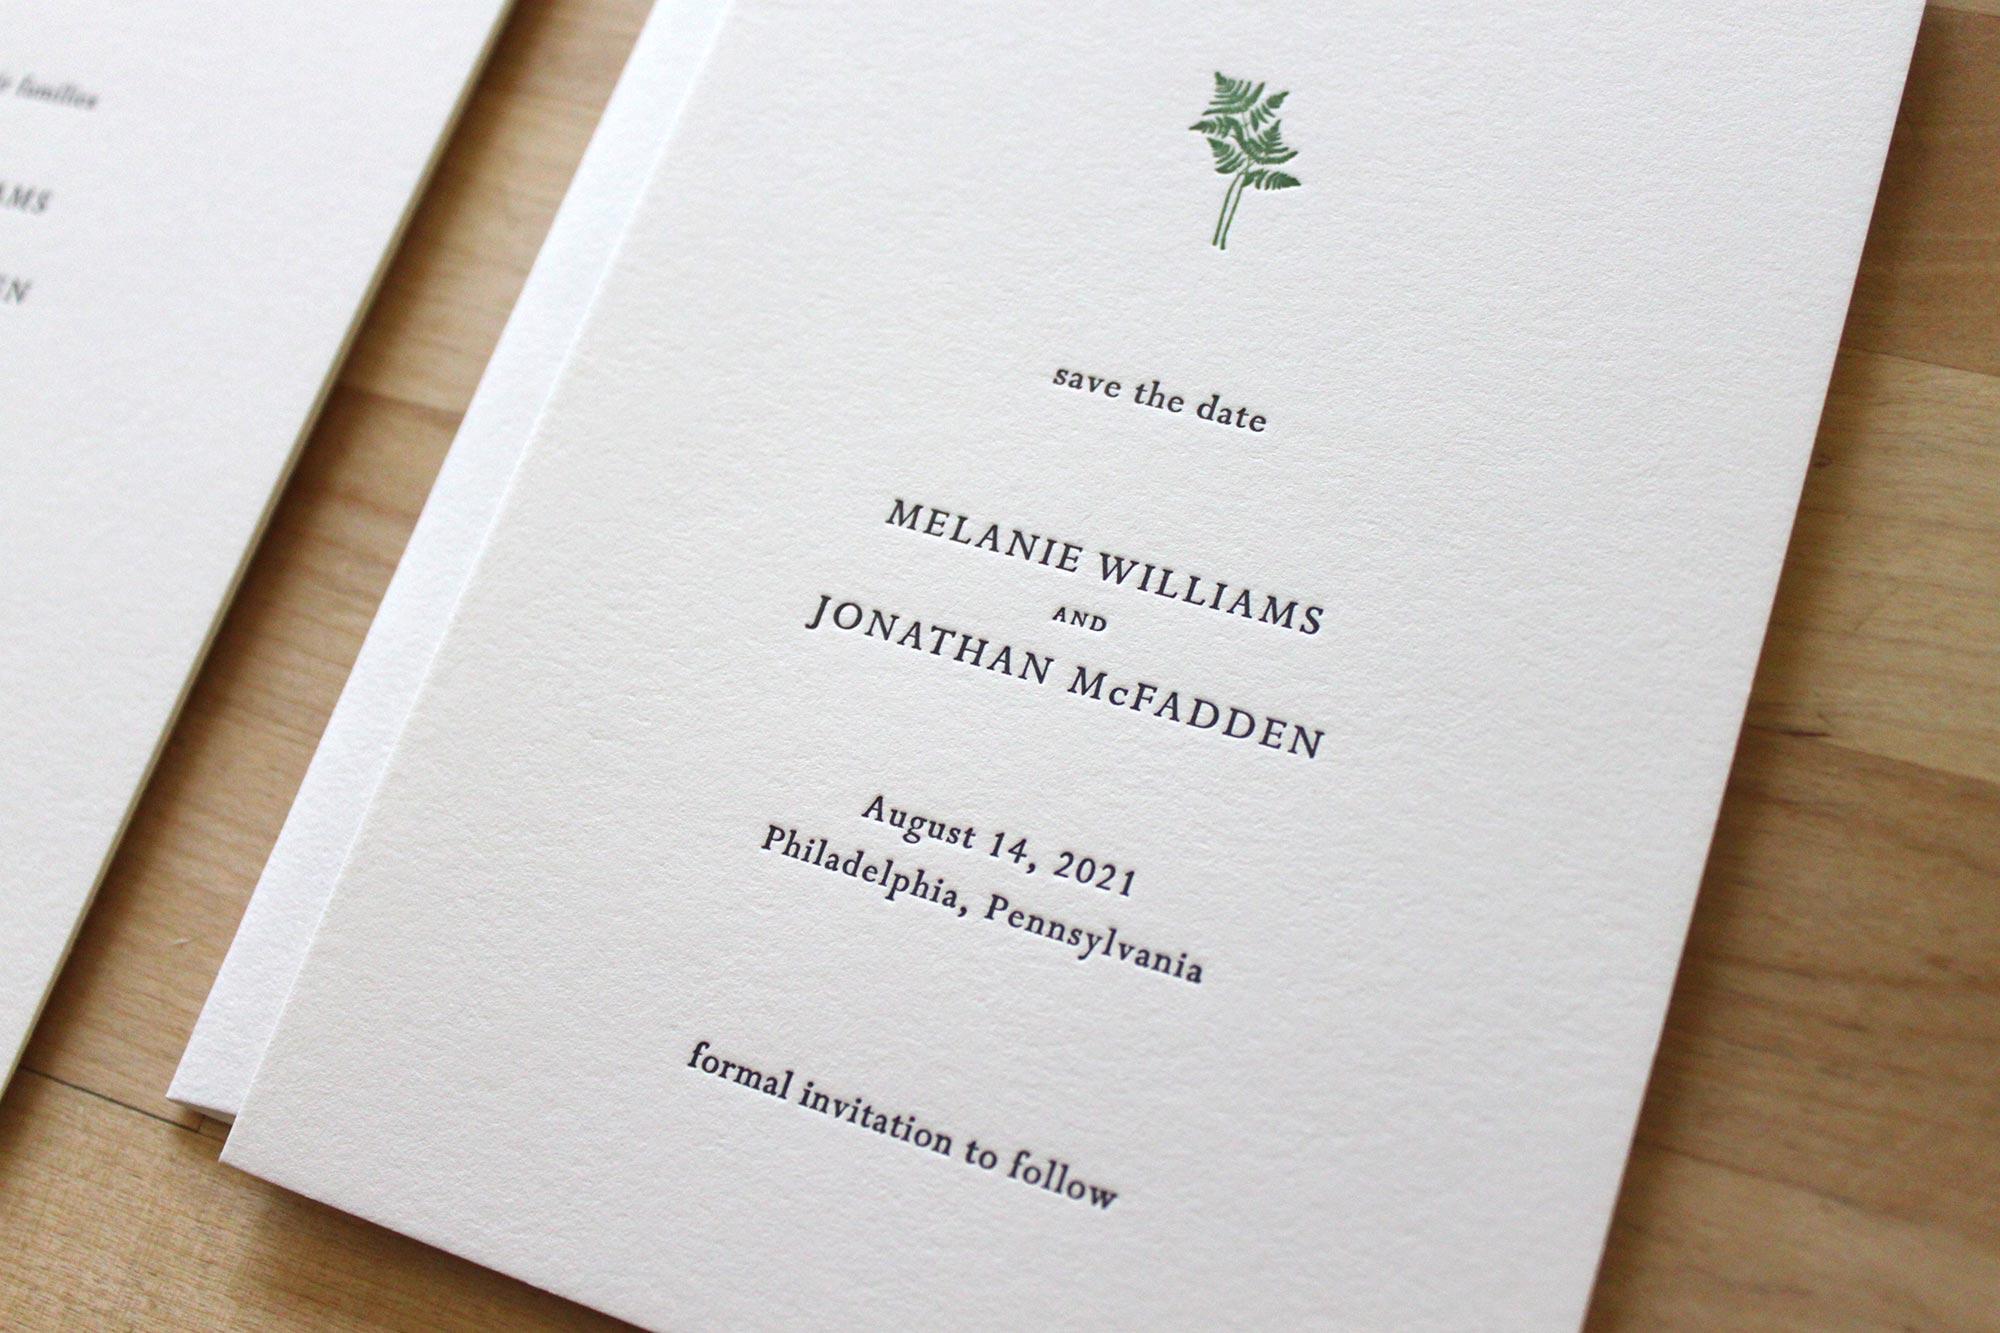 Fern-&-Leaf-3-letterpress-wedding-invitations.jpg